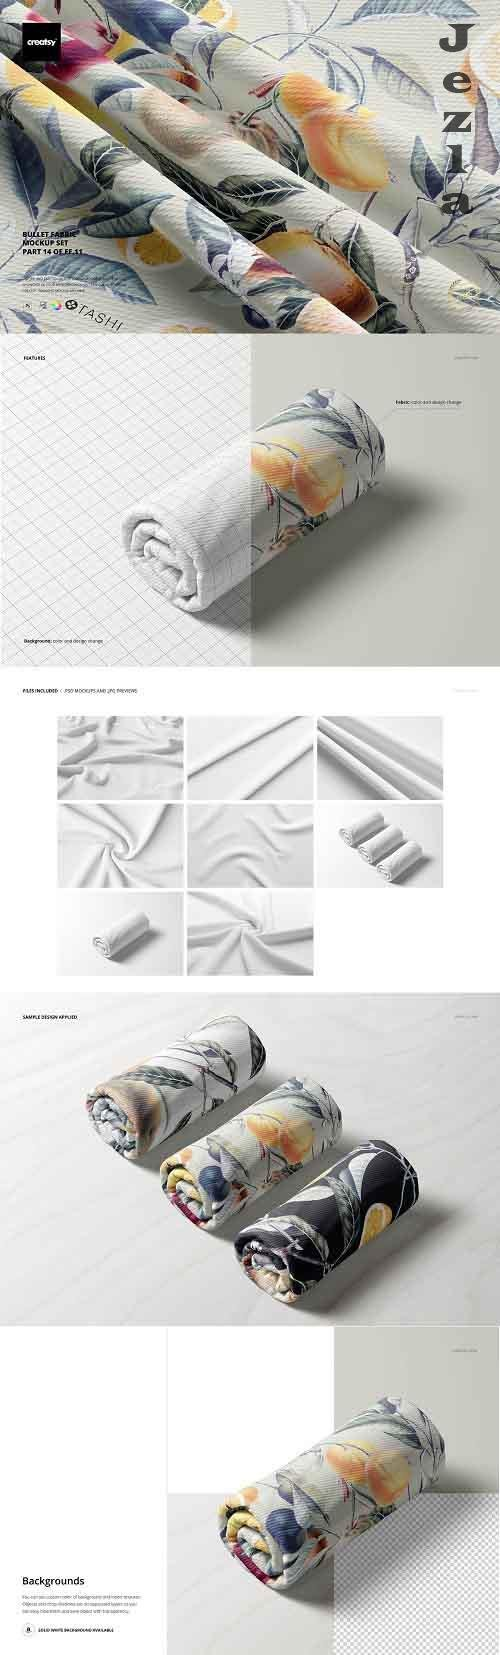 CreativeMarket - Bullet Fabric Mockup Set (14/FFv.11) 5749752